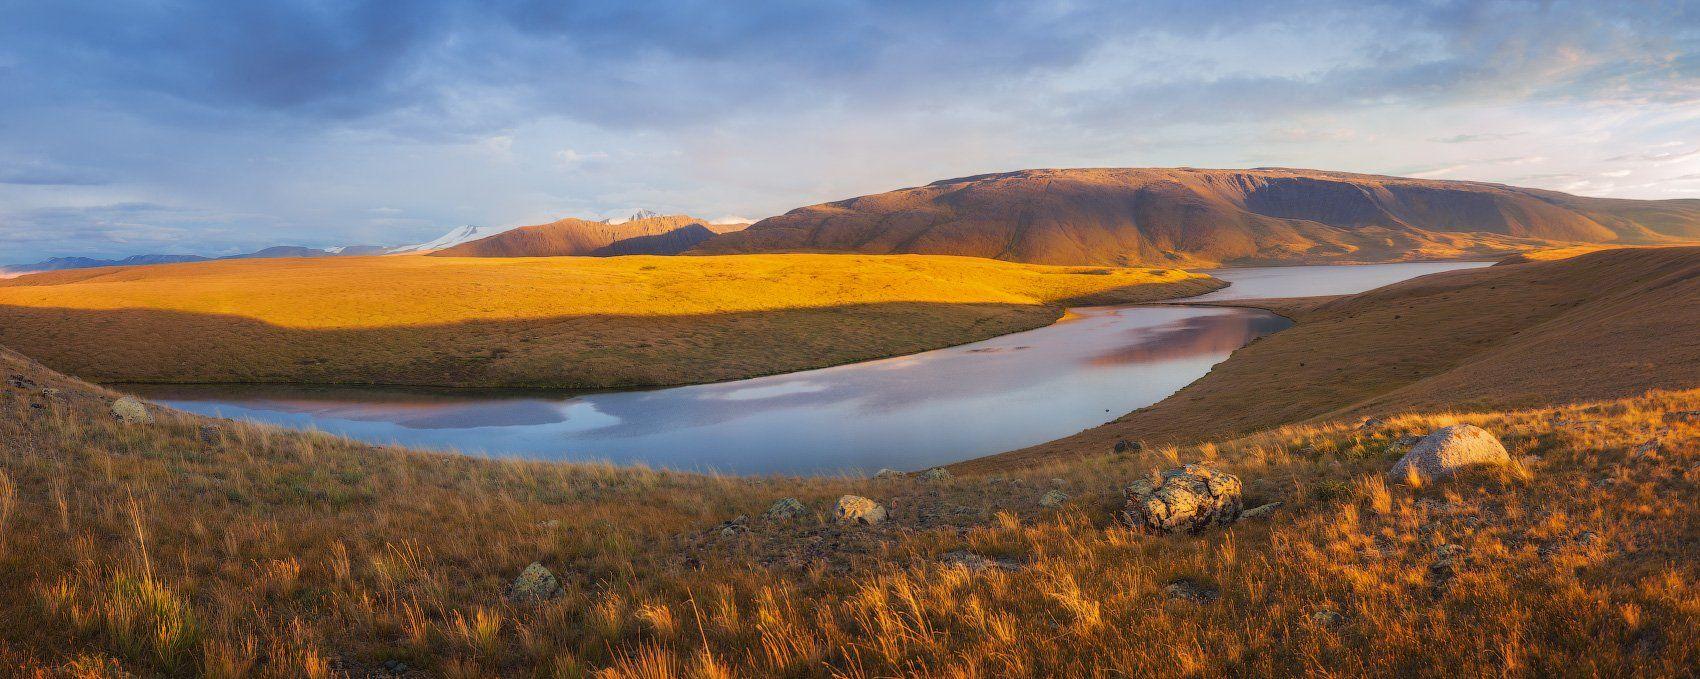 алтай, закат, лето, озеро, укок, Андрей Уляшев (Mercand)